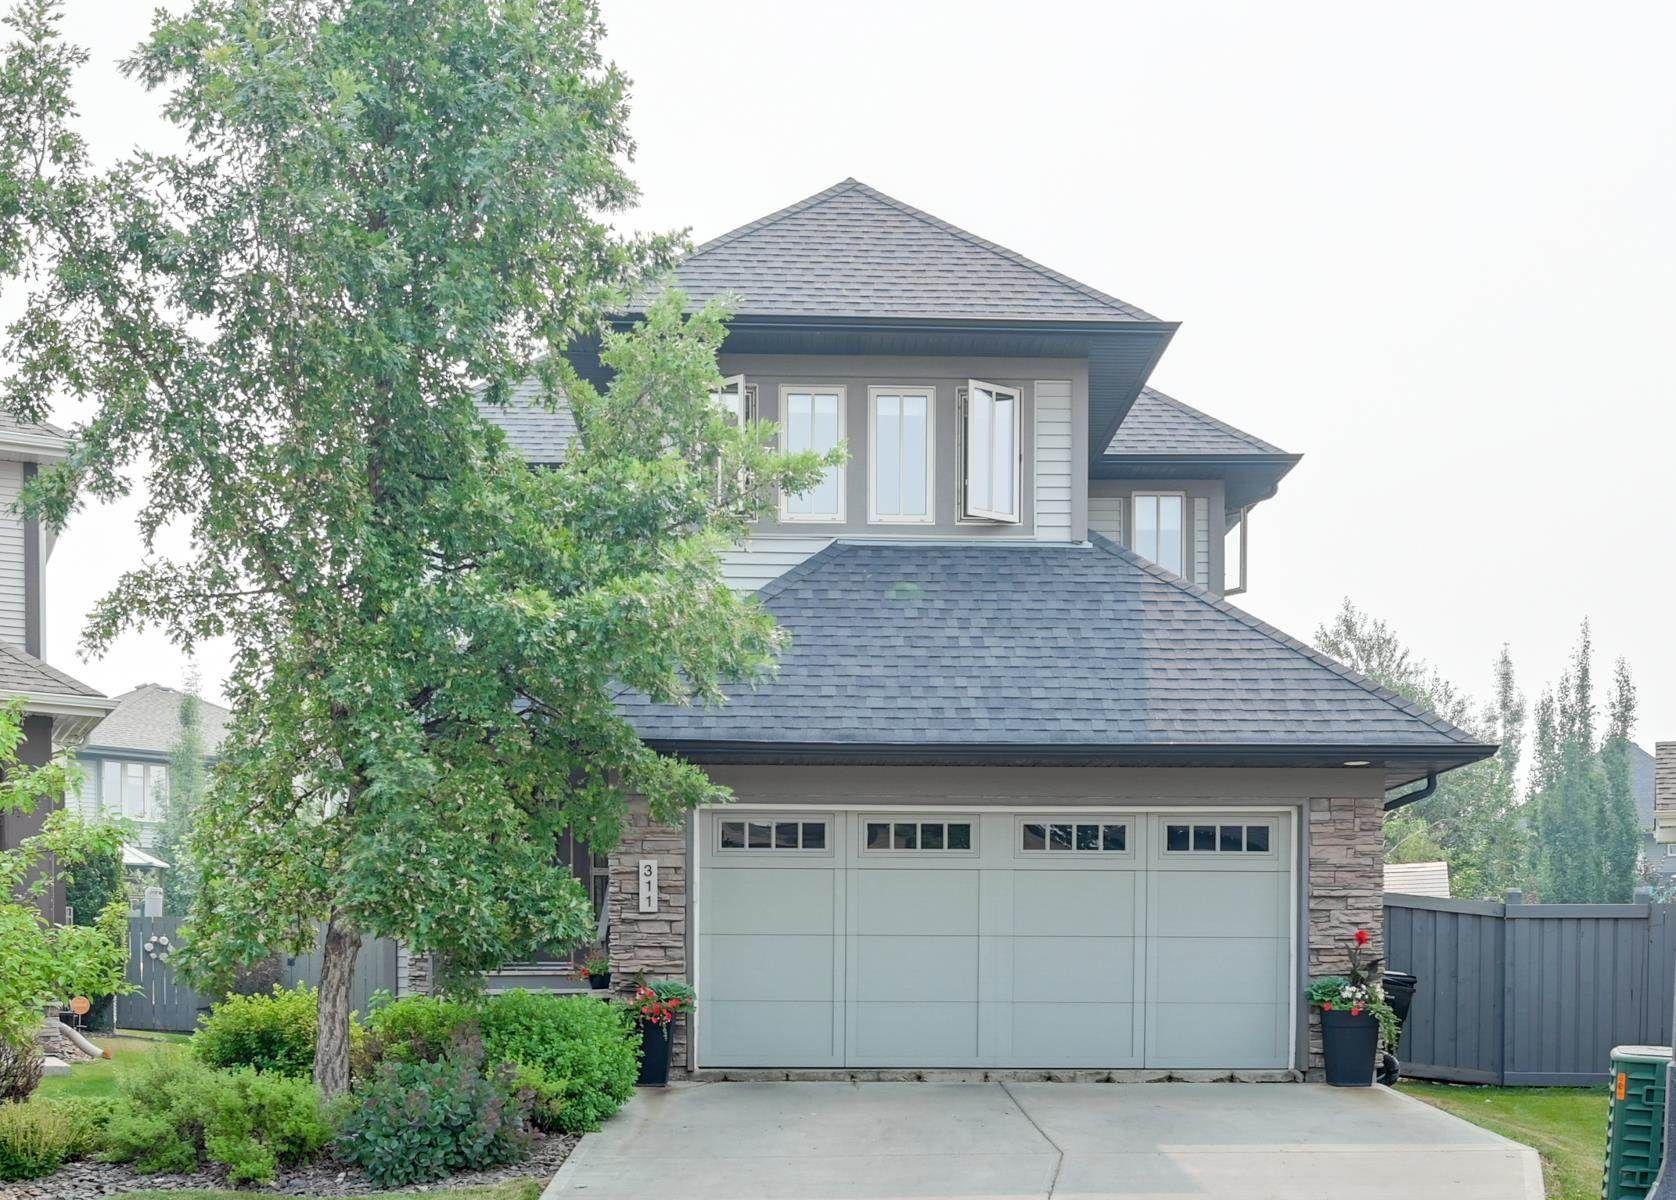 Main Photo: 311 AMBLESIDE Link SW in Edmonton: Zone 56 House for sale : MLS®# E4254920